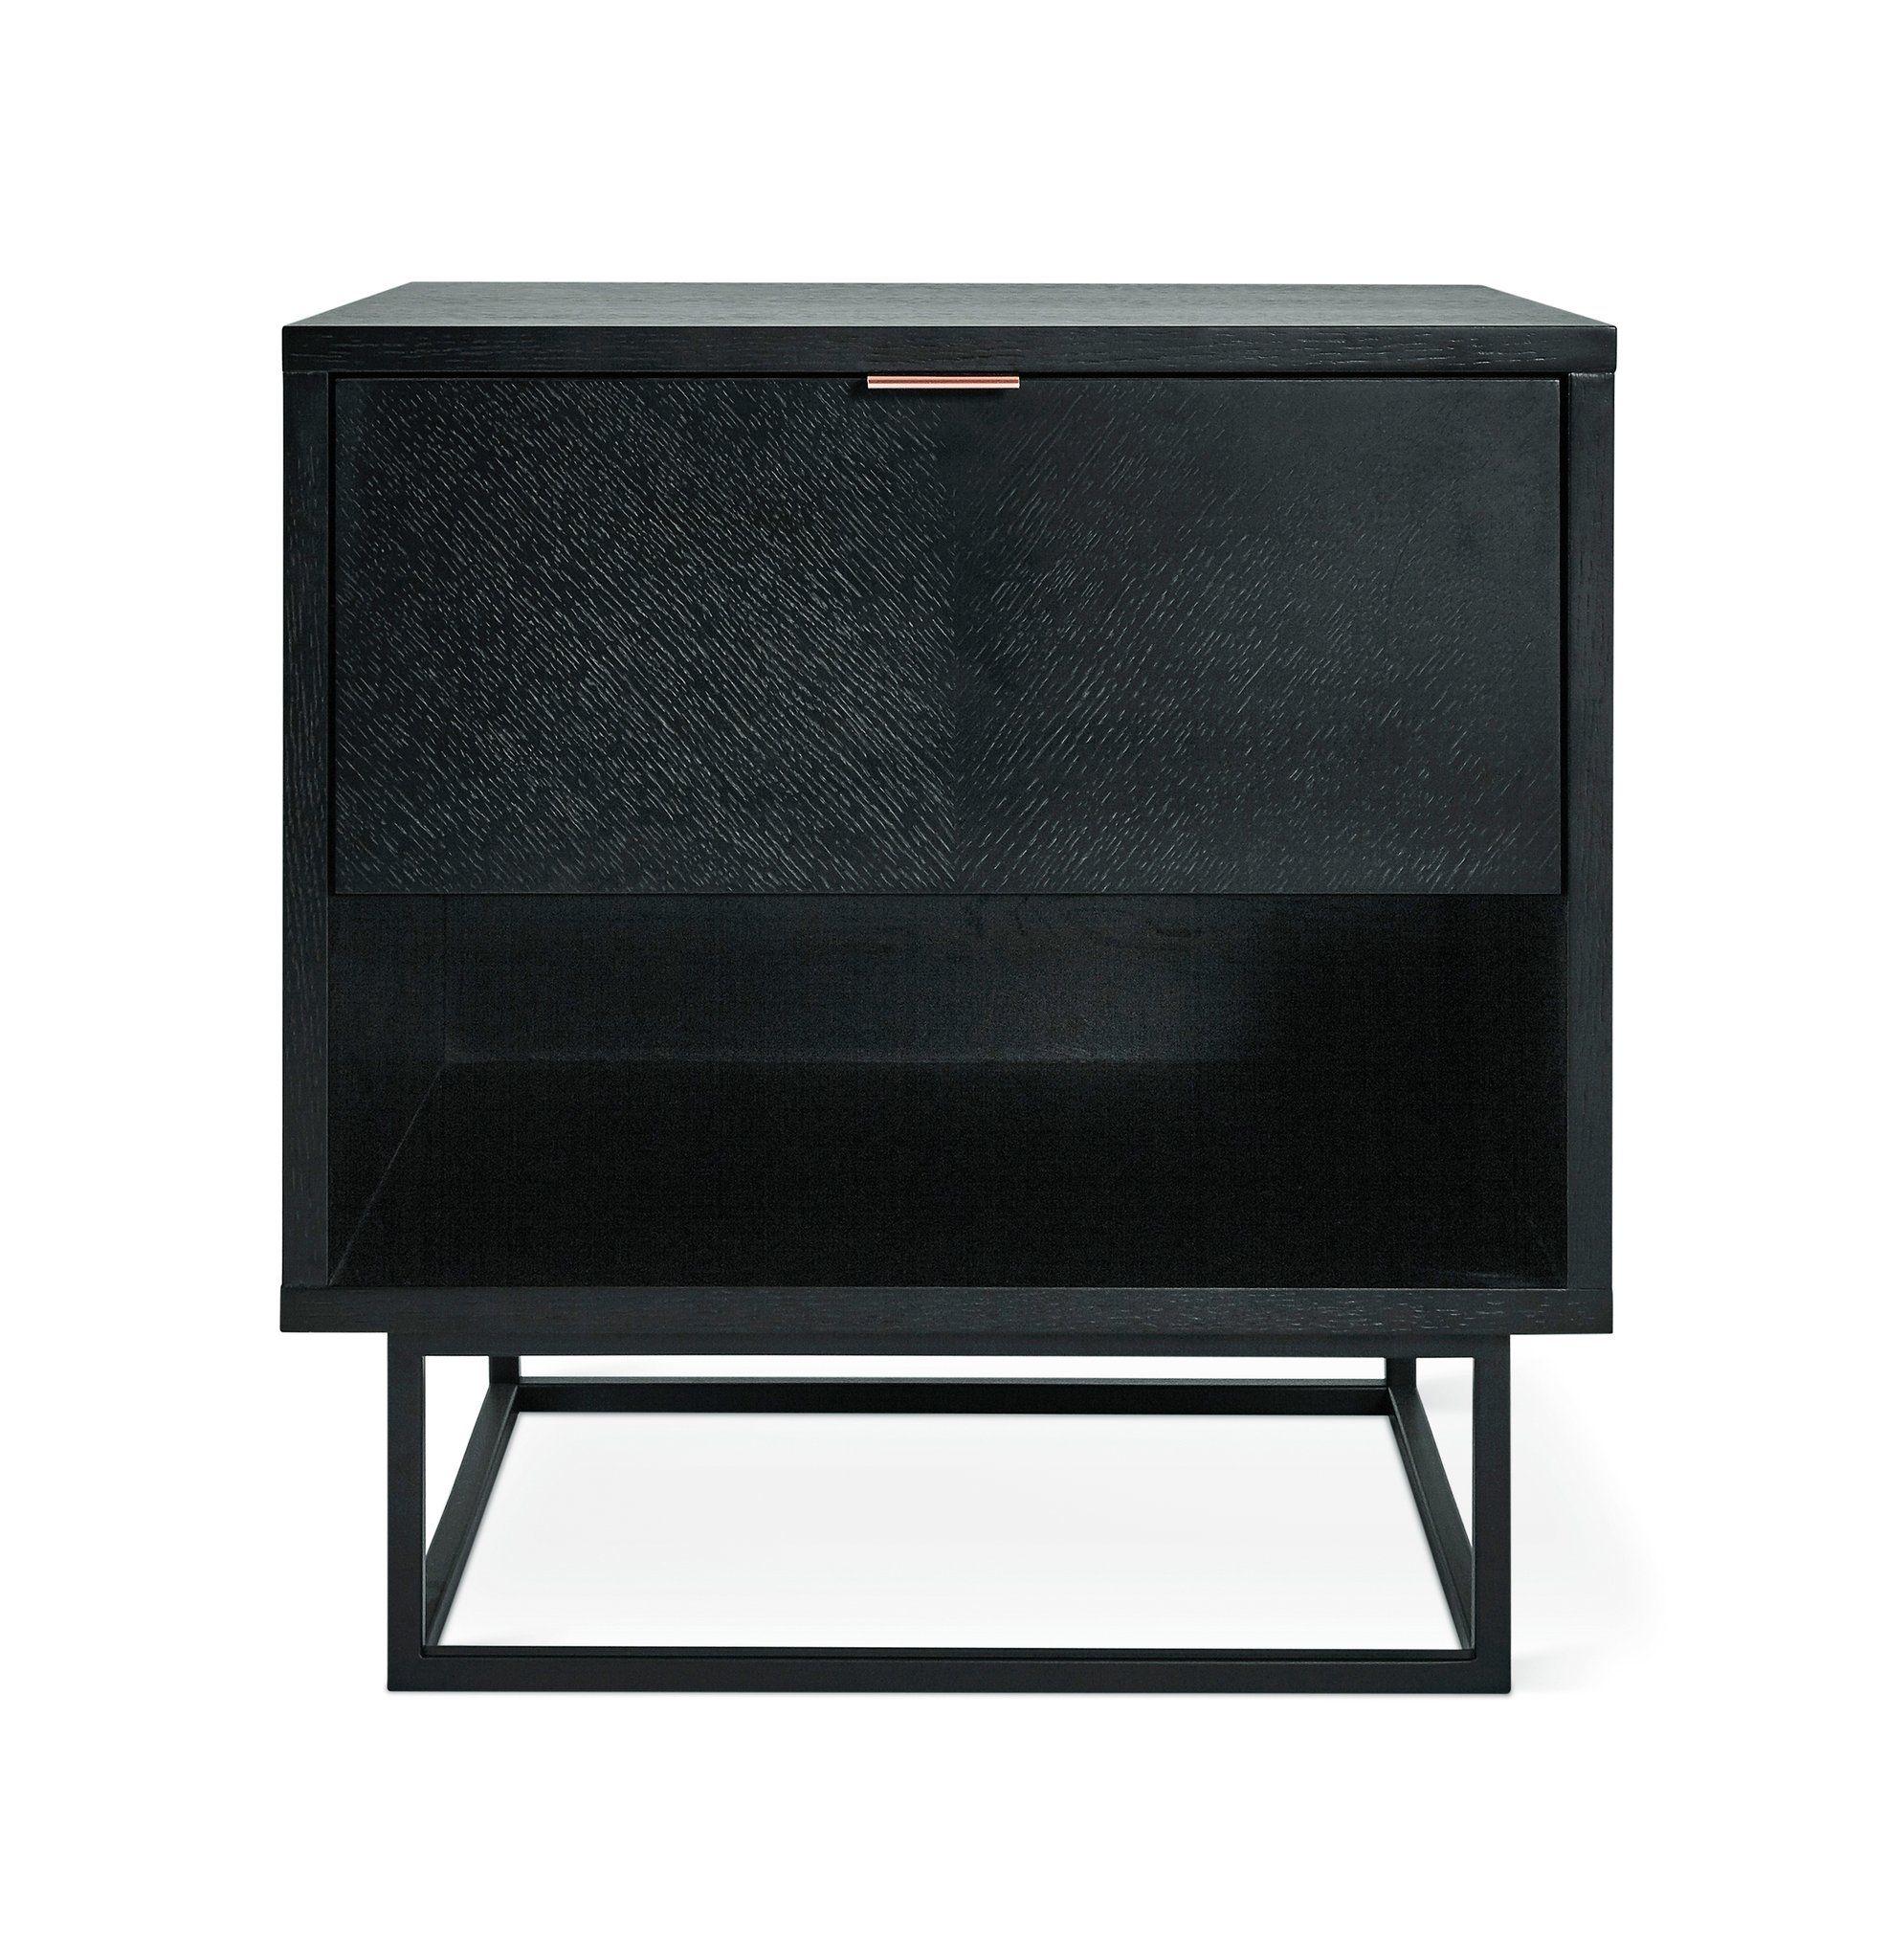 Myles end table in black oak design by gus modern table storage furniture storage